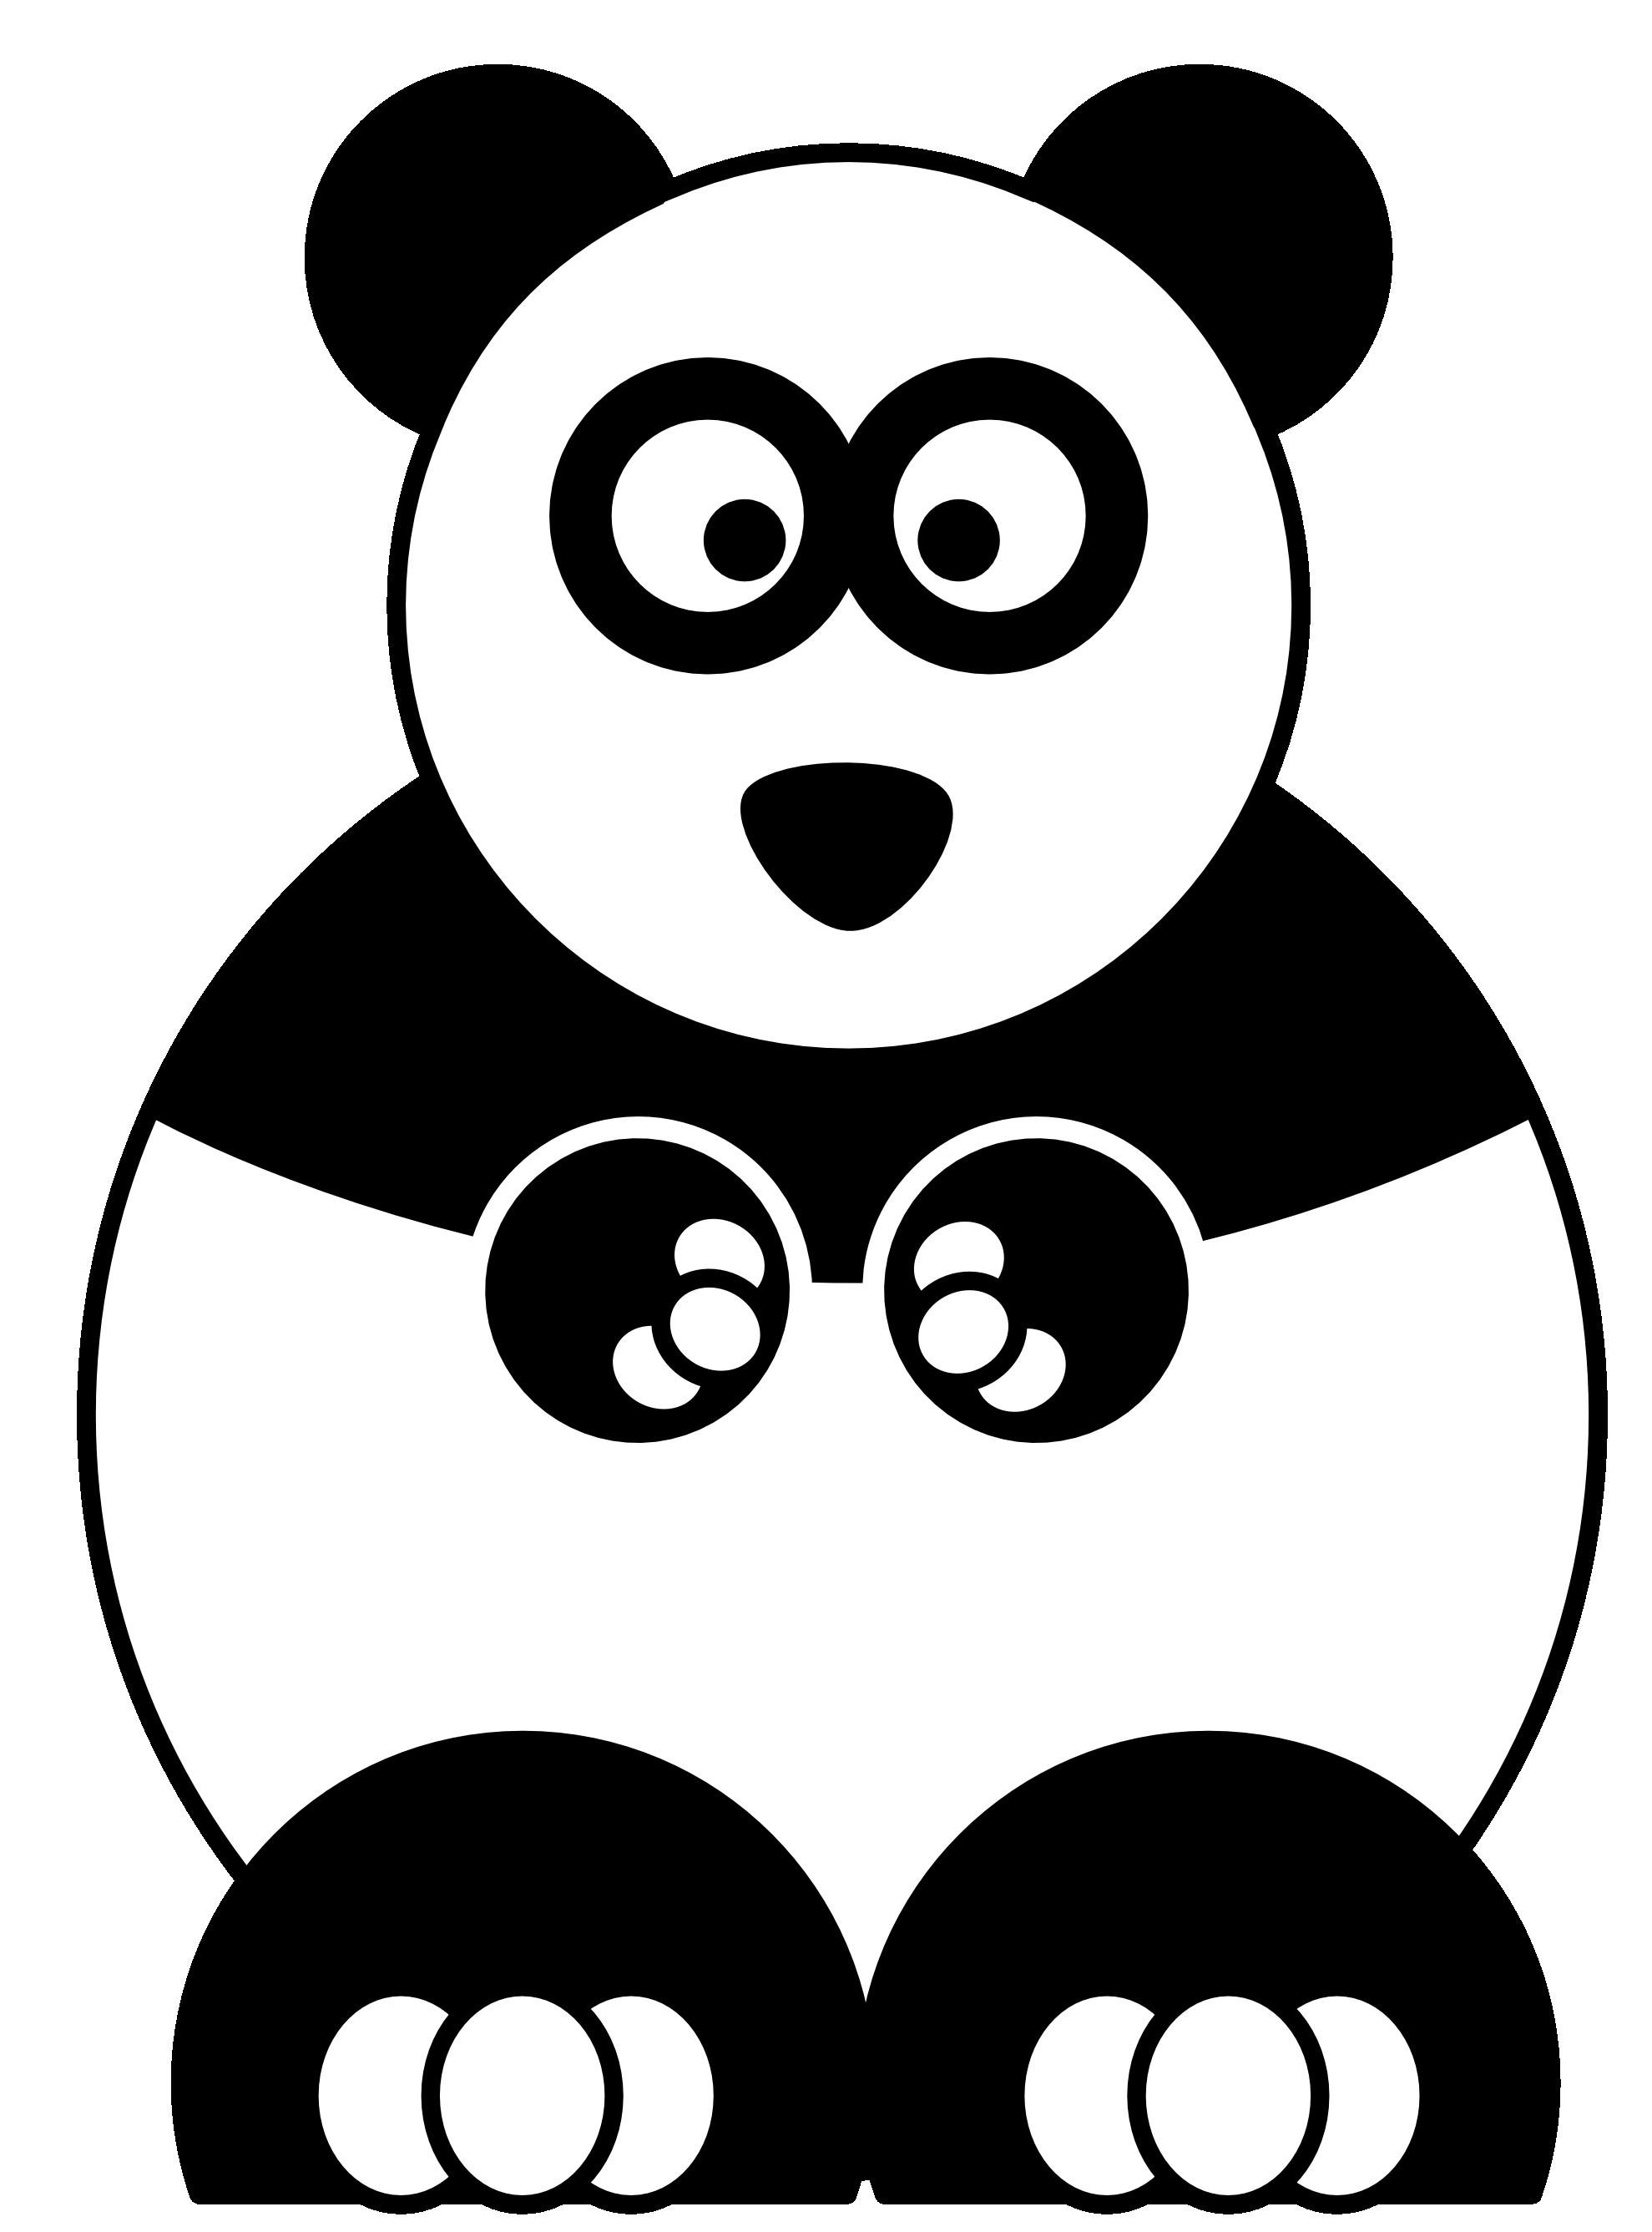 Coloring pages baby panda - 8 Pics Of Cute Cartoon Panda Coloring Pages Baby Panda Coloring